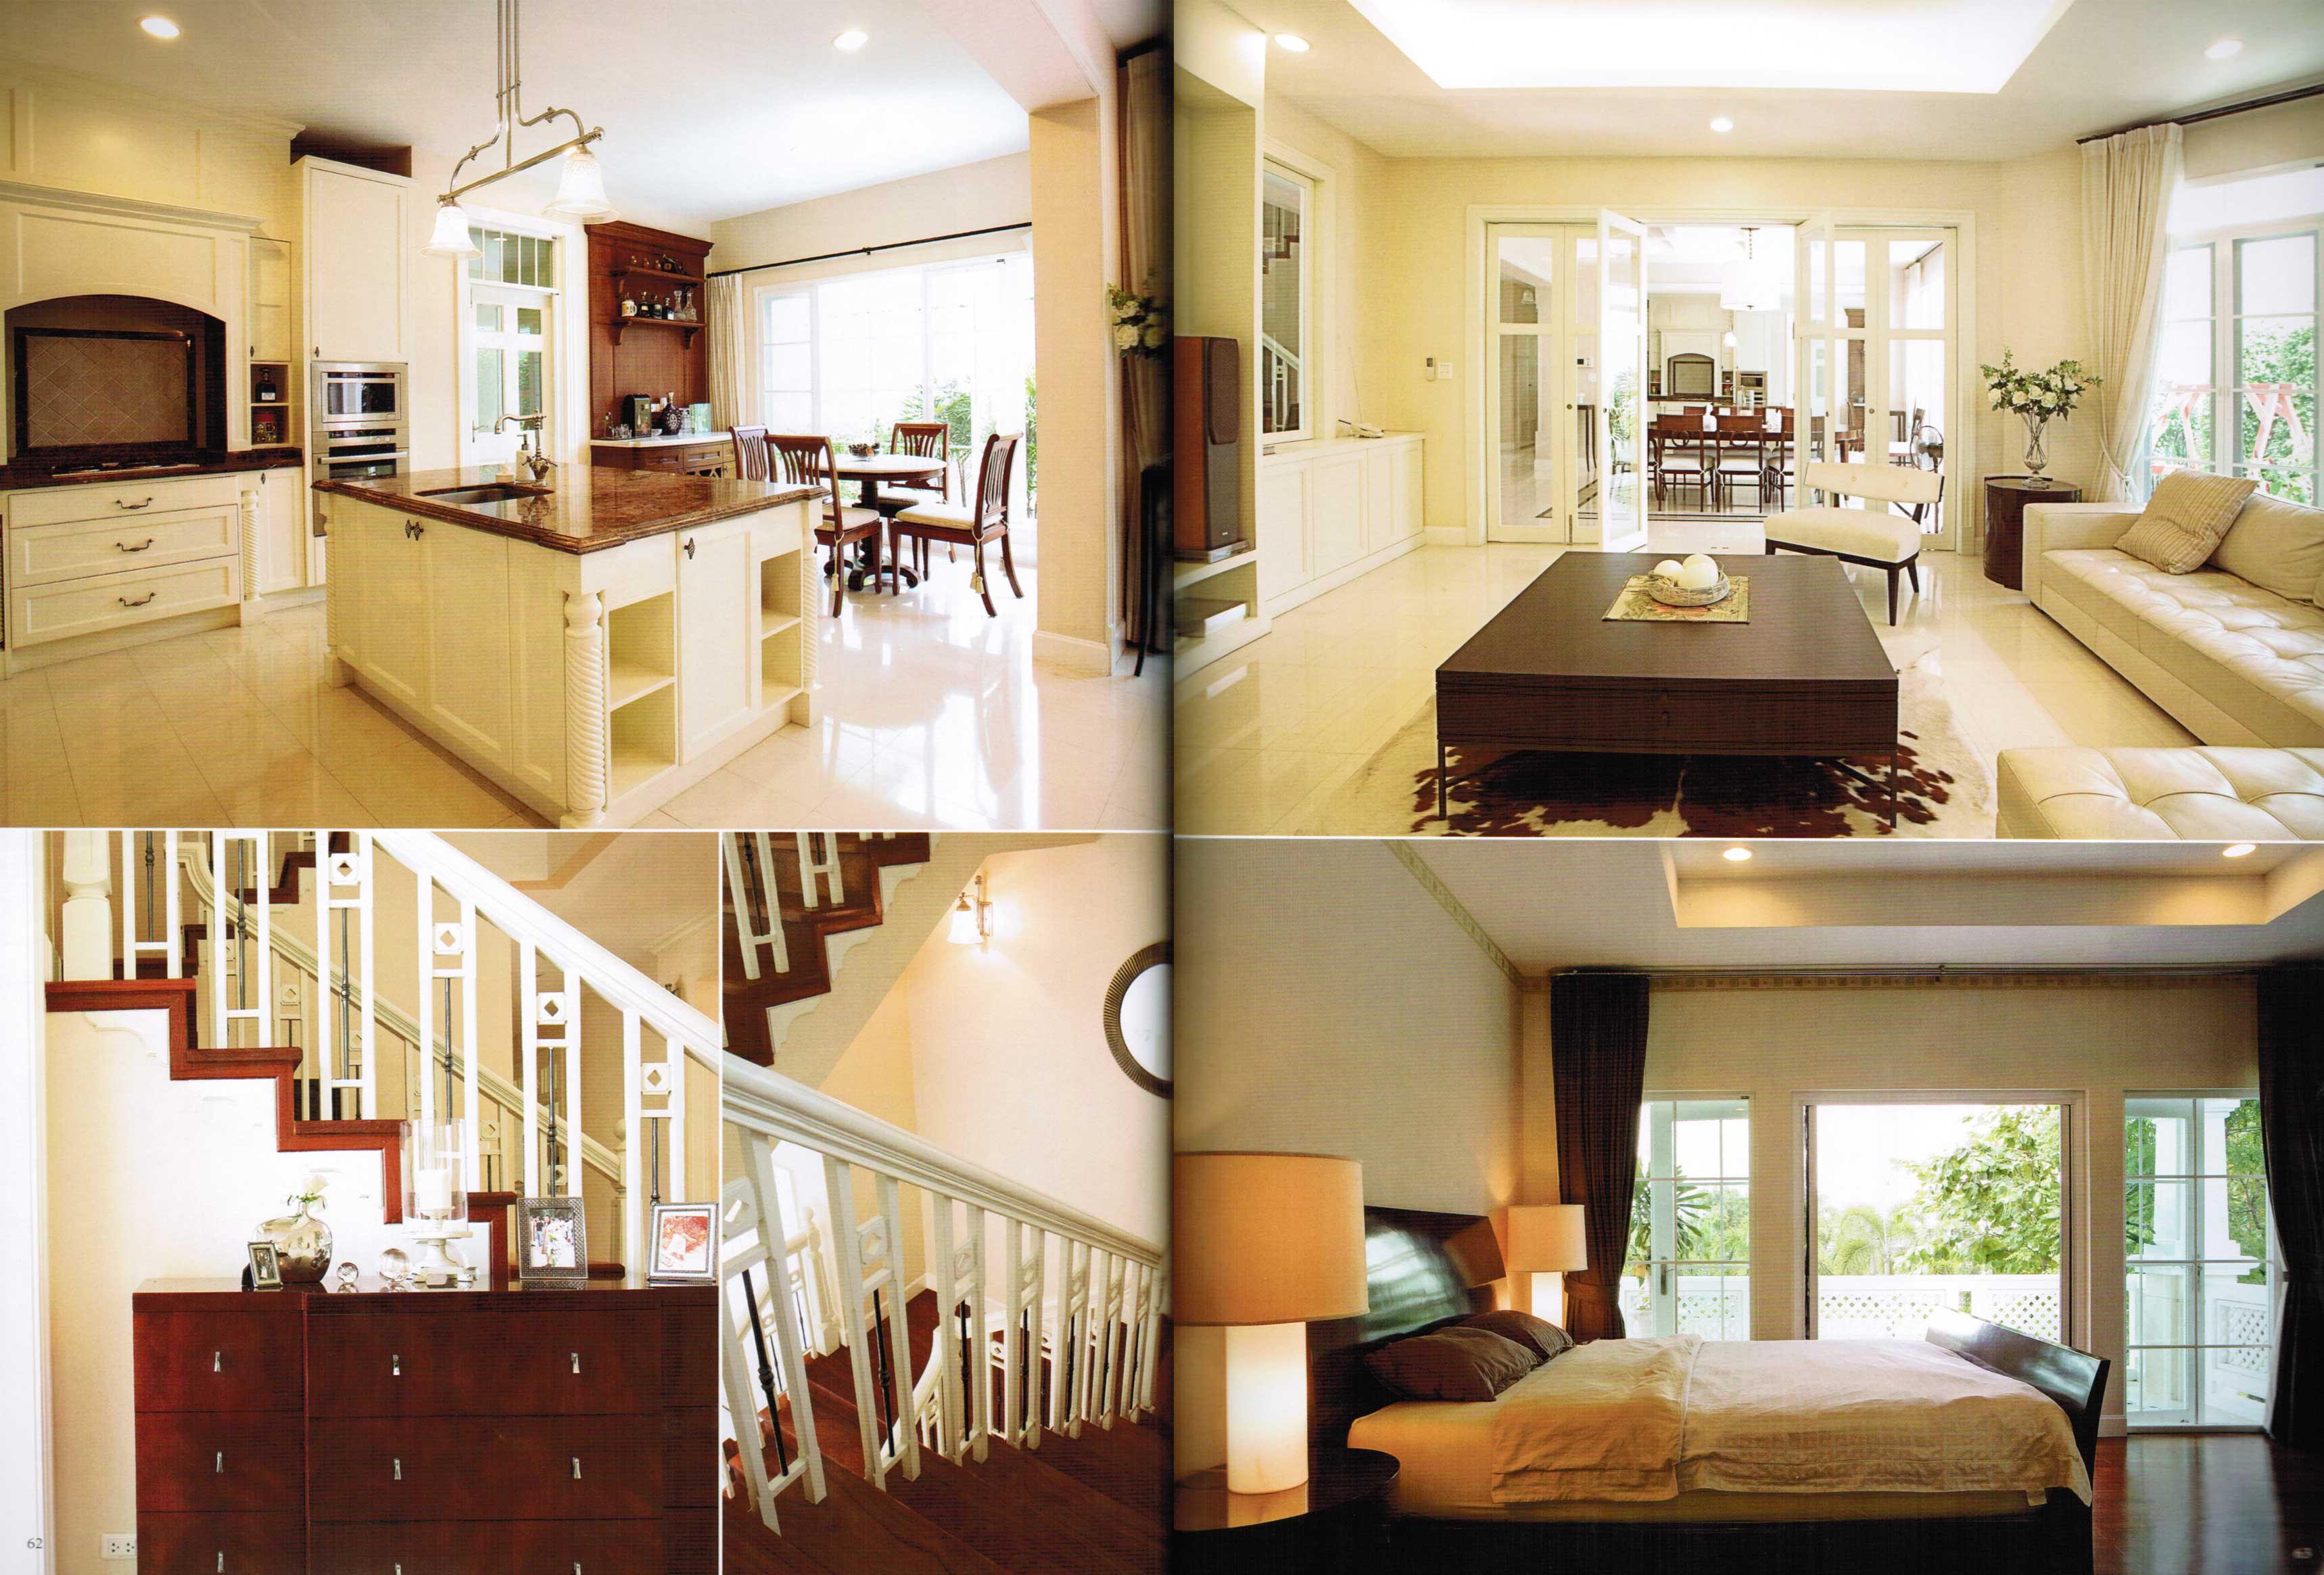 Chailimpamontri resident interior design by TRIMODE STUDIO +